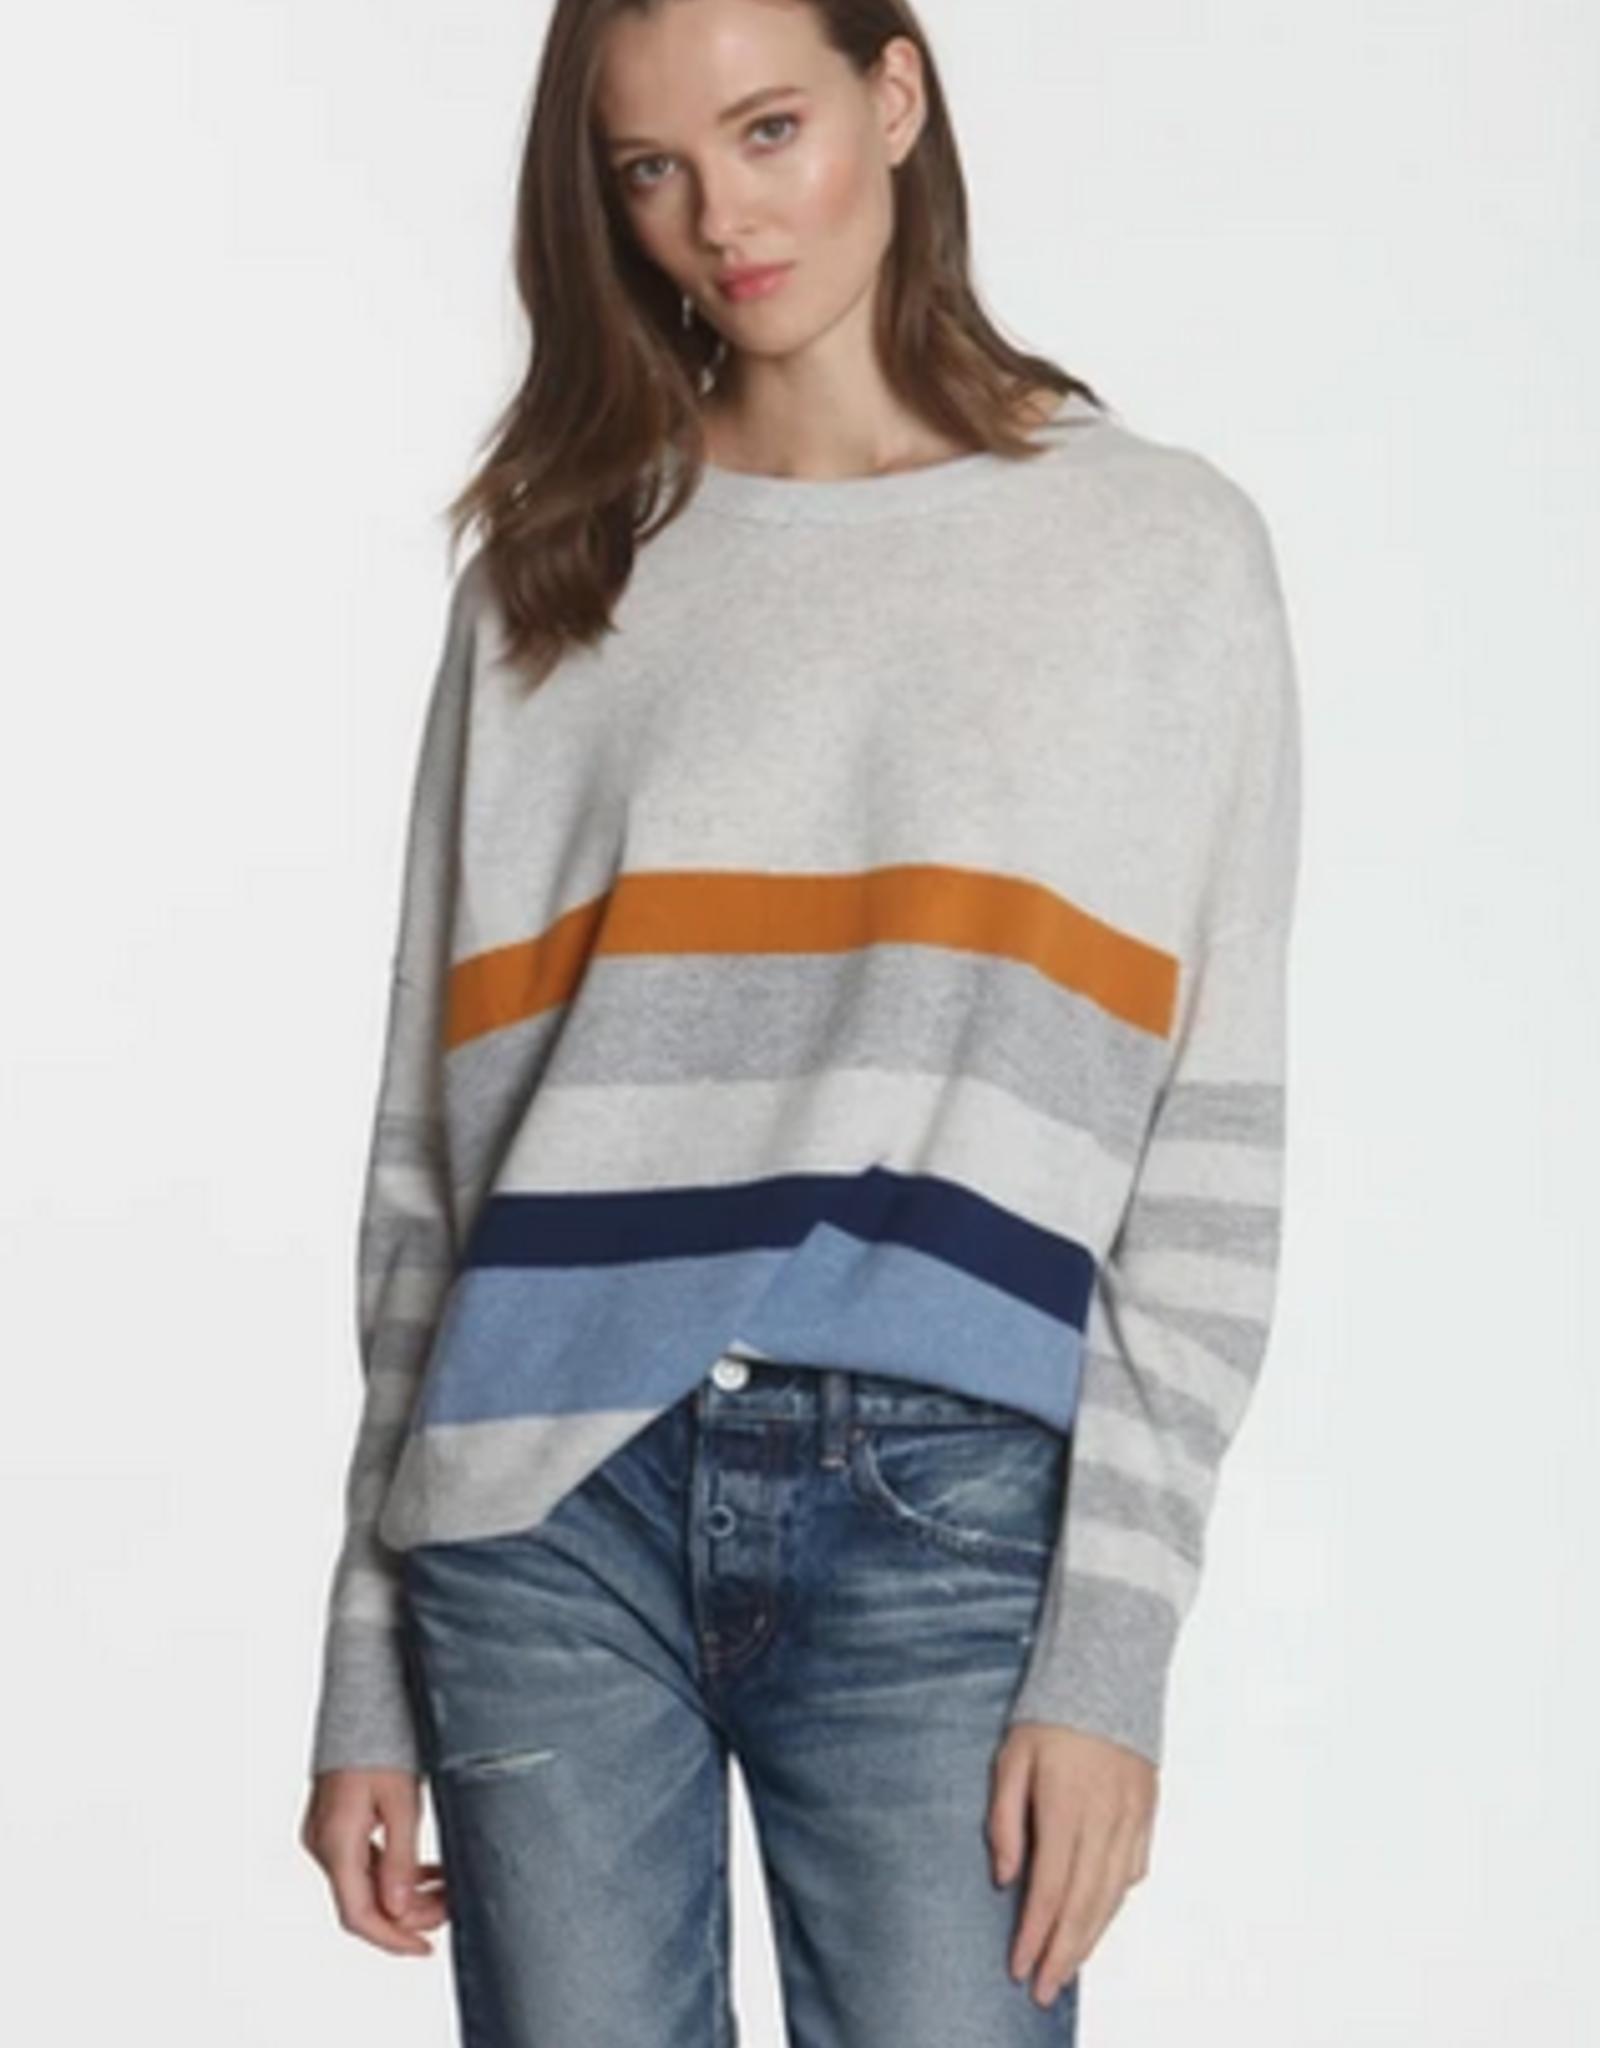 LABEL+thread Crayola Wide Scoop Sweater